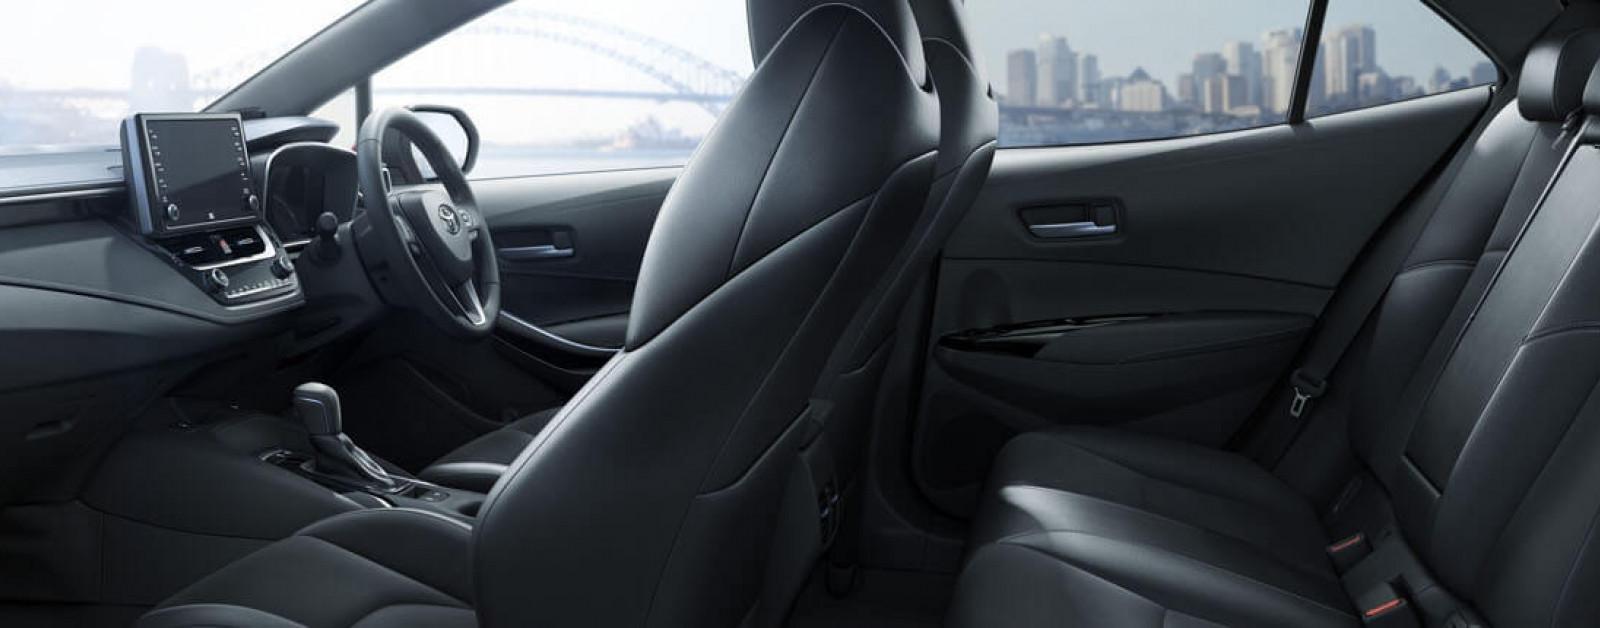 New Toyota Corolla for sale - Lismore Toyota